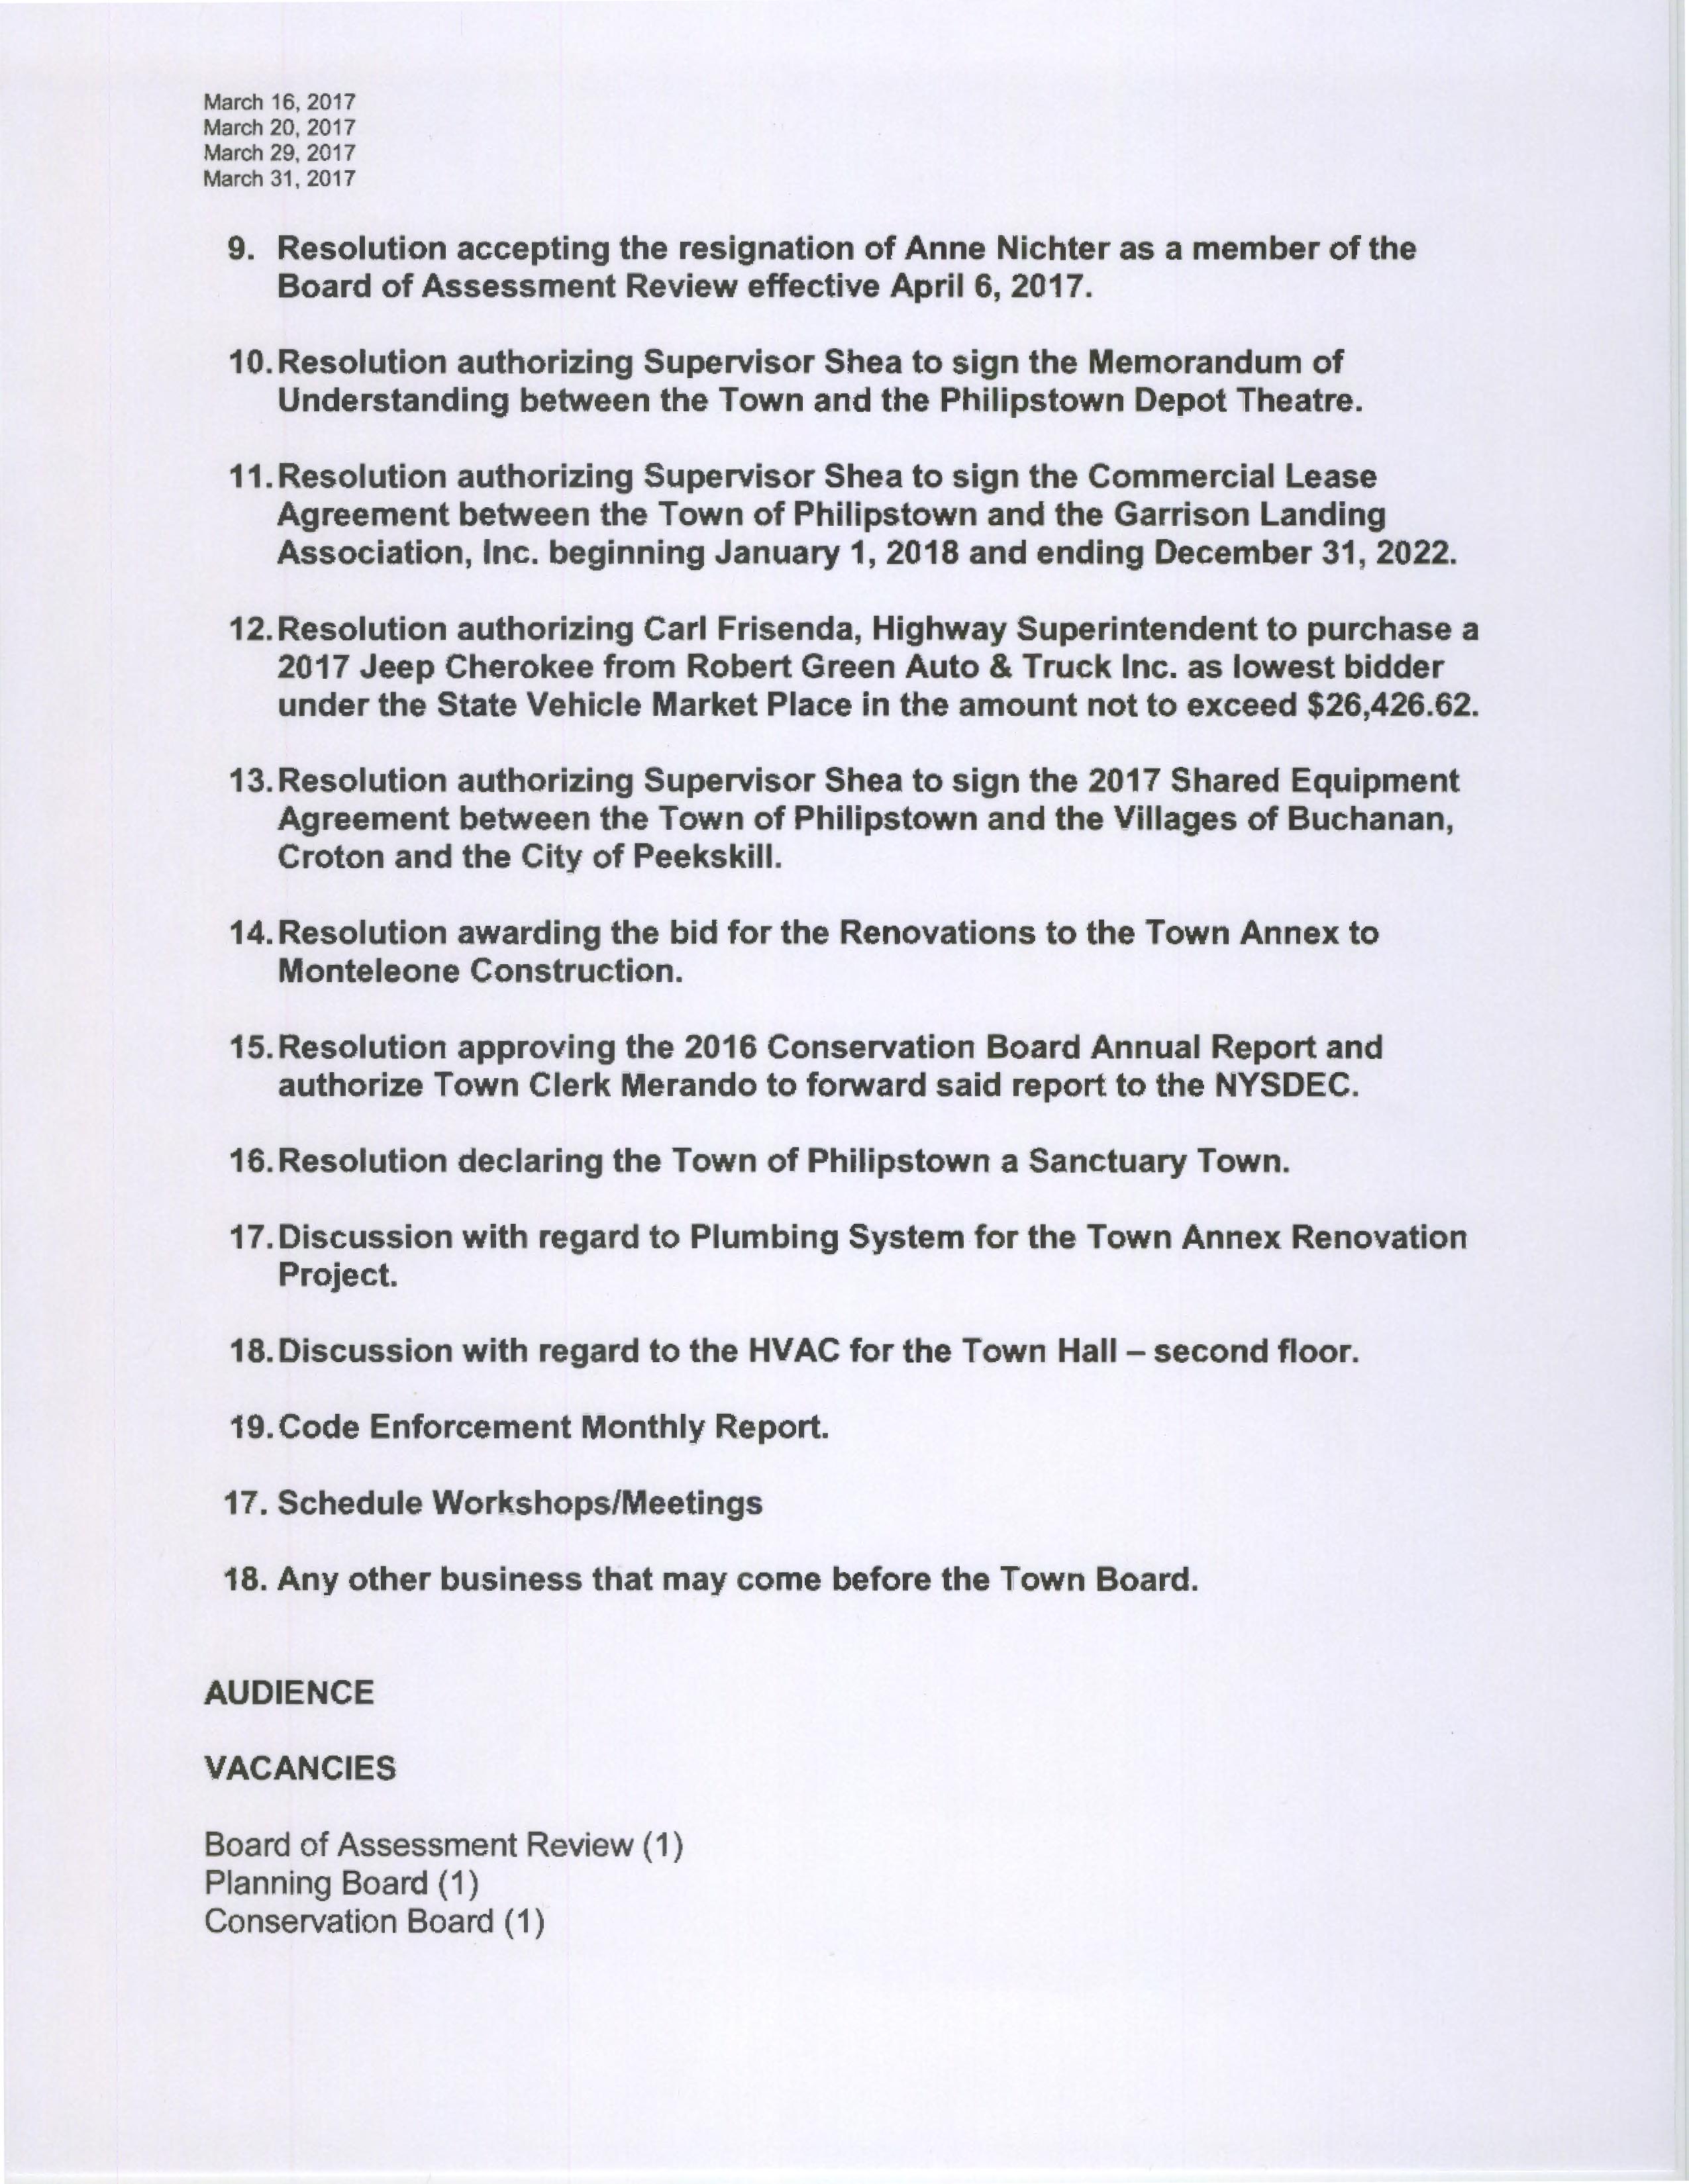 2017_04-06_Town_Board_Agenda_2.jpg